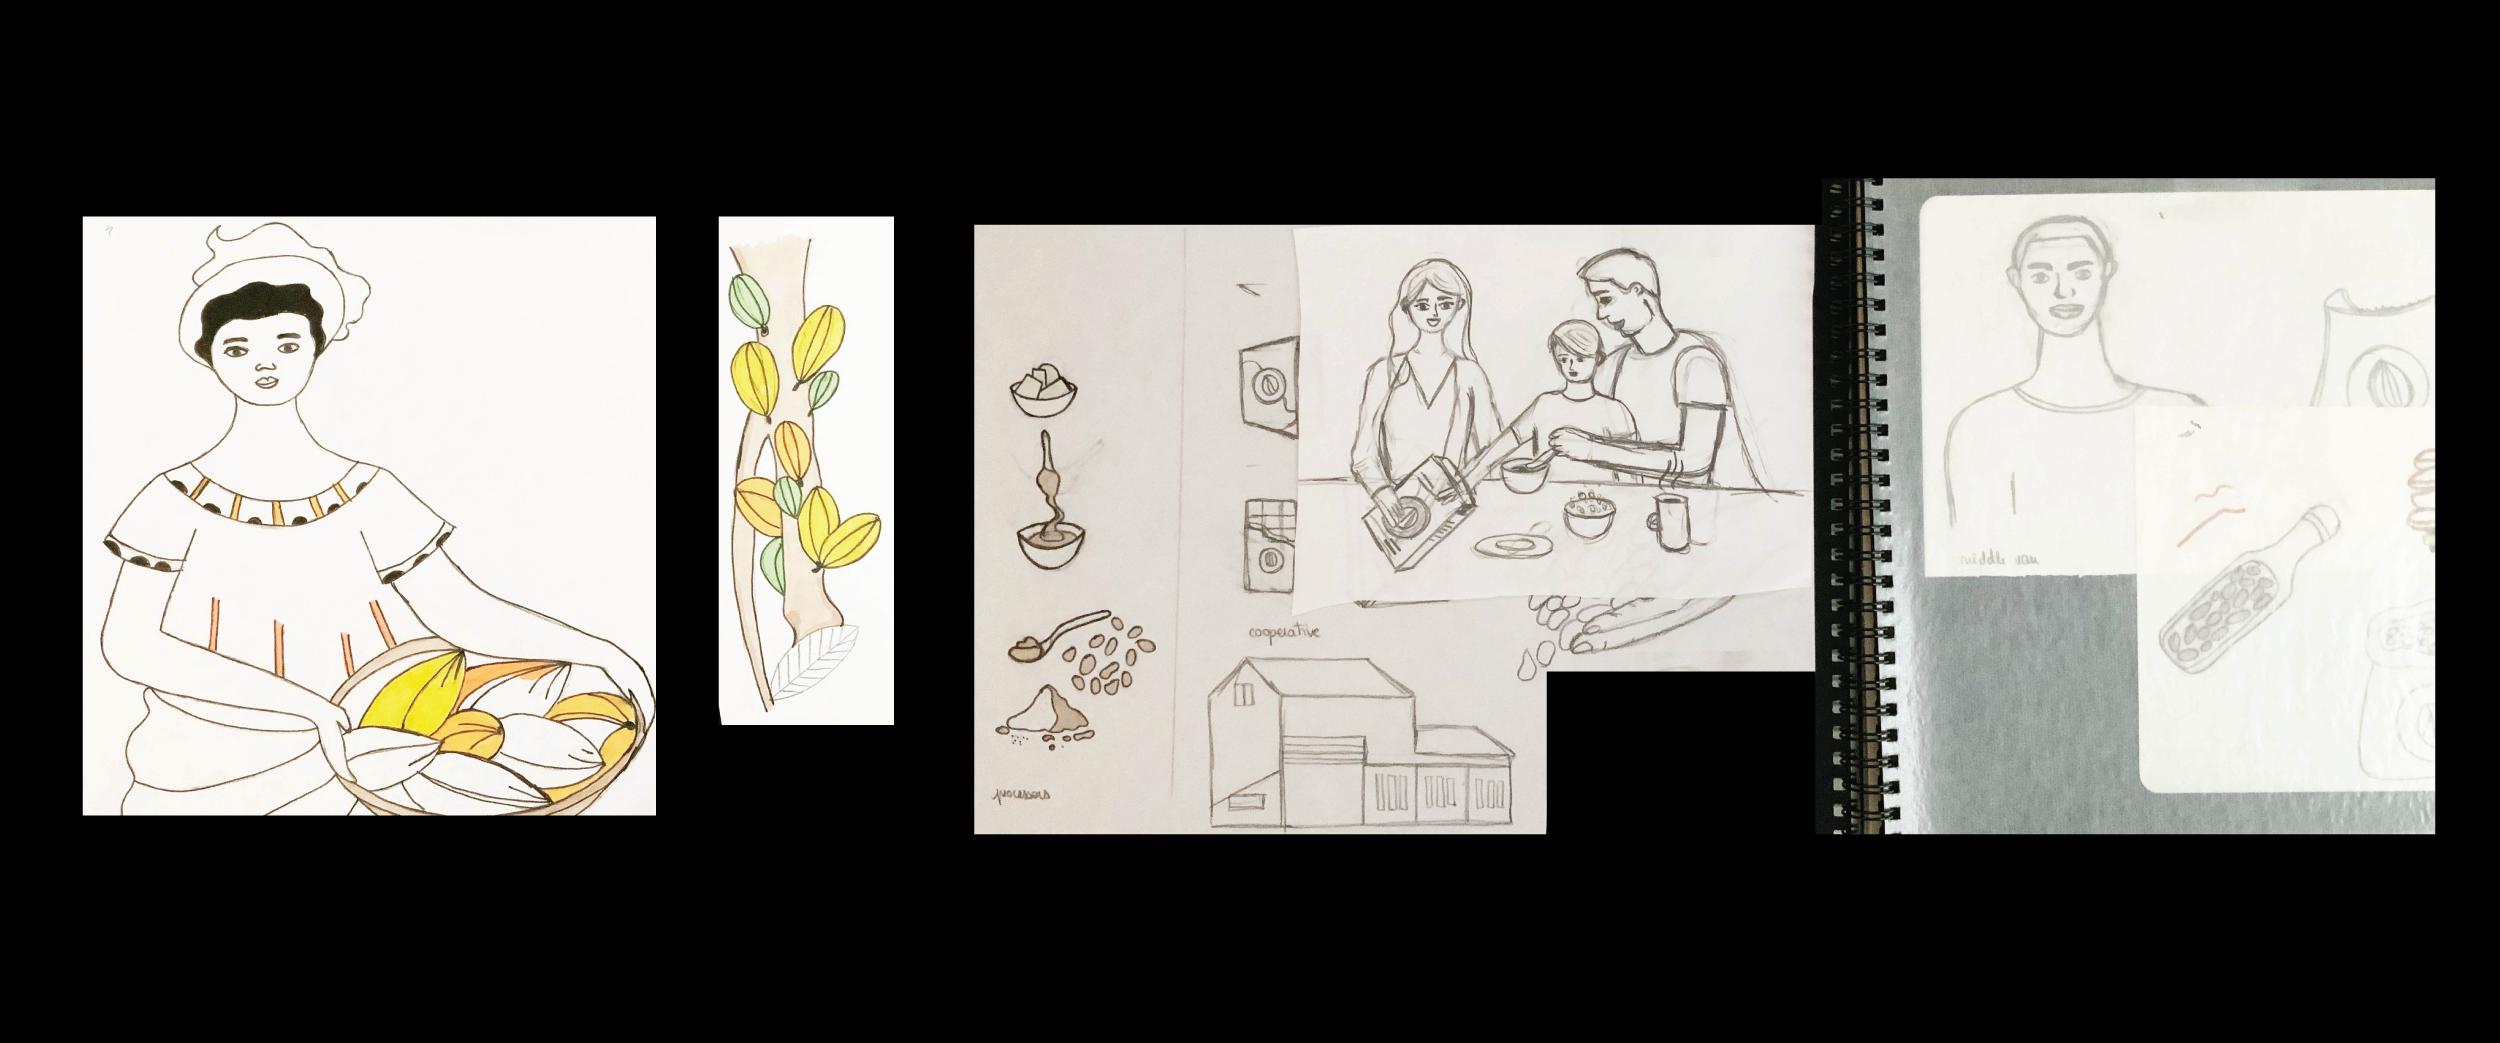 illustrations drawings